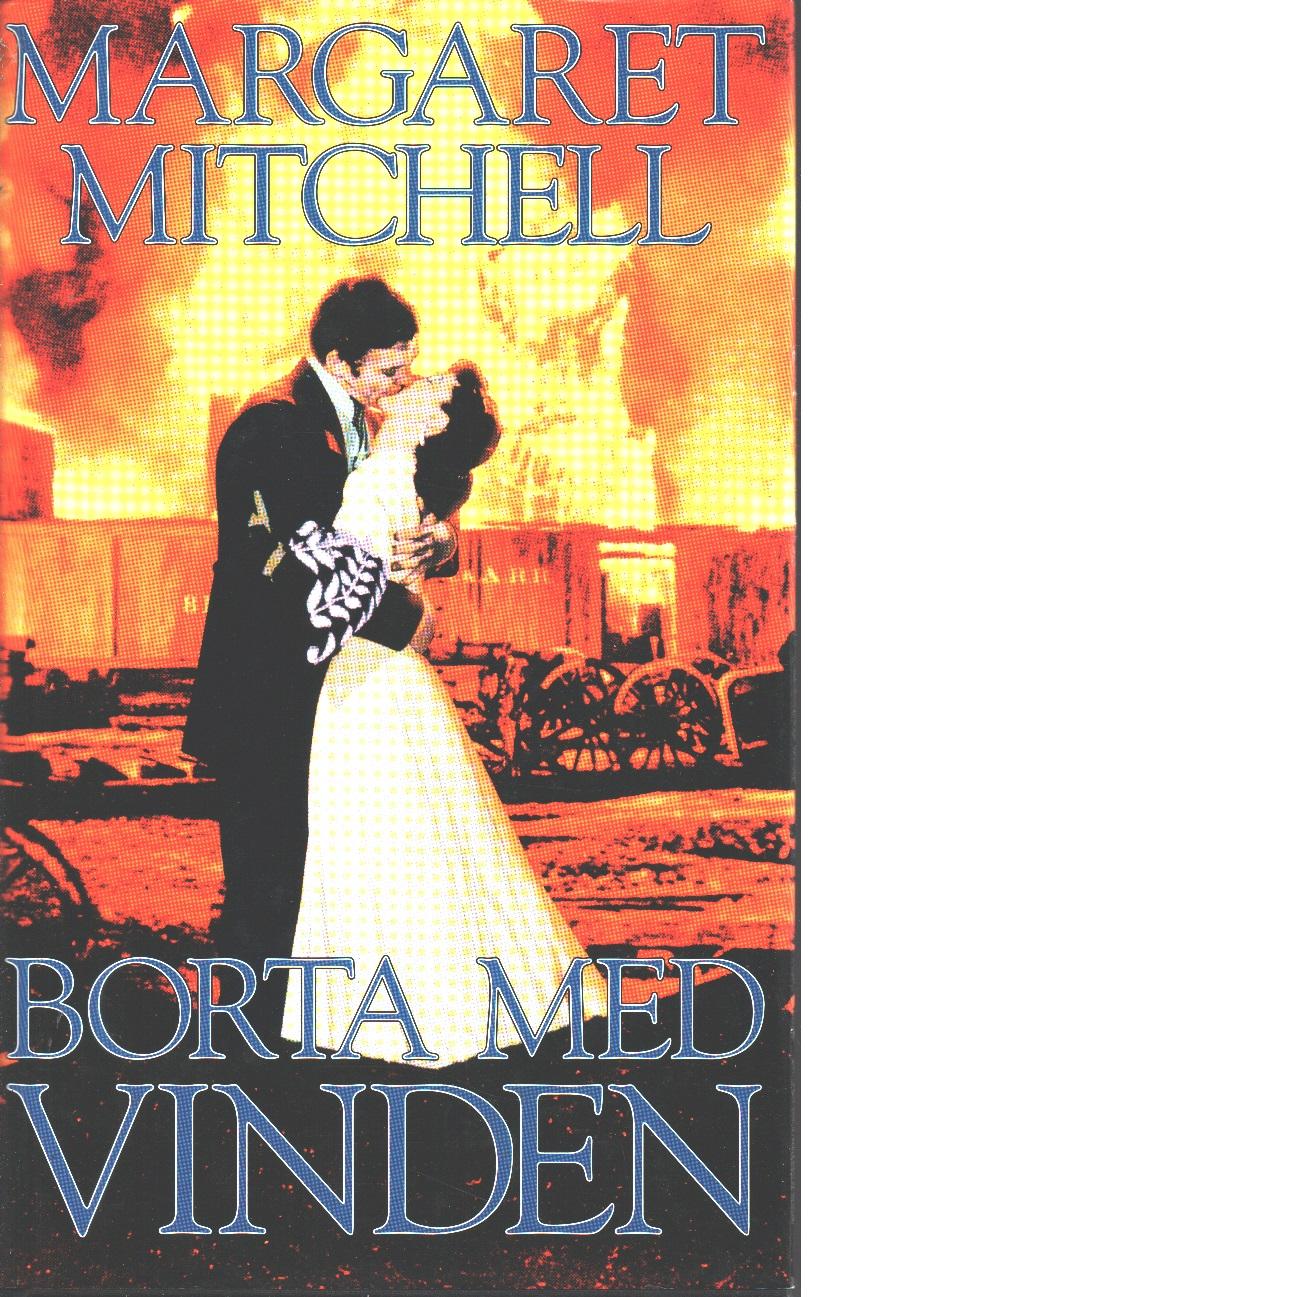 Borta med vinden - Mitchell, Margaret